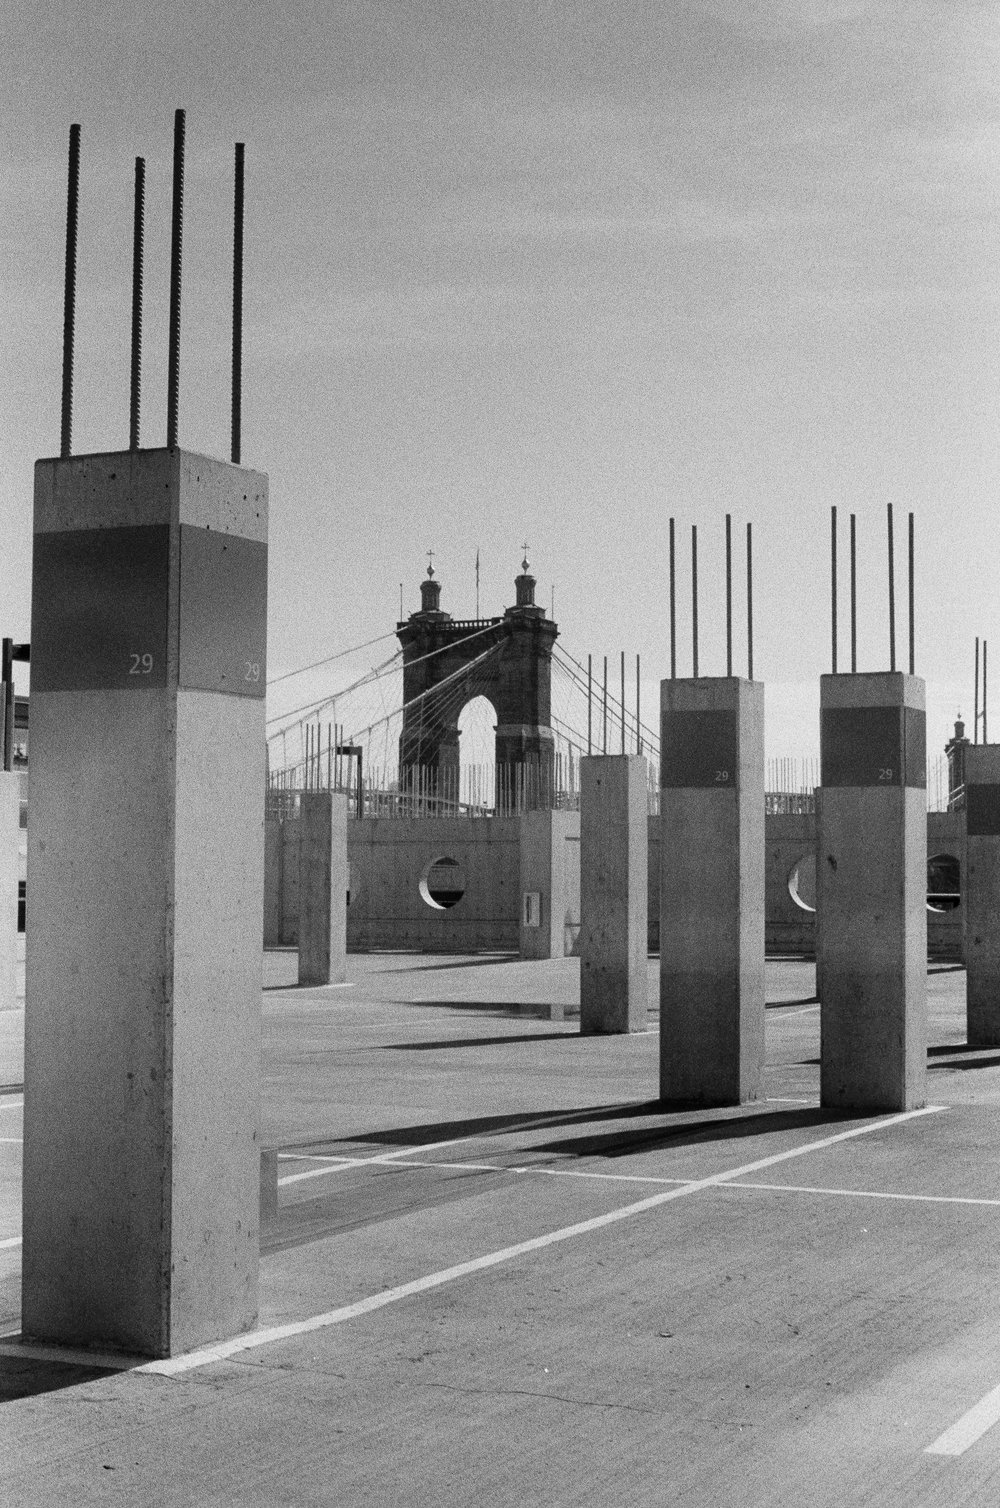 Pillars to the Roebling Bridge